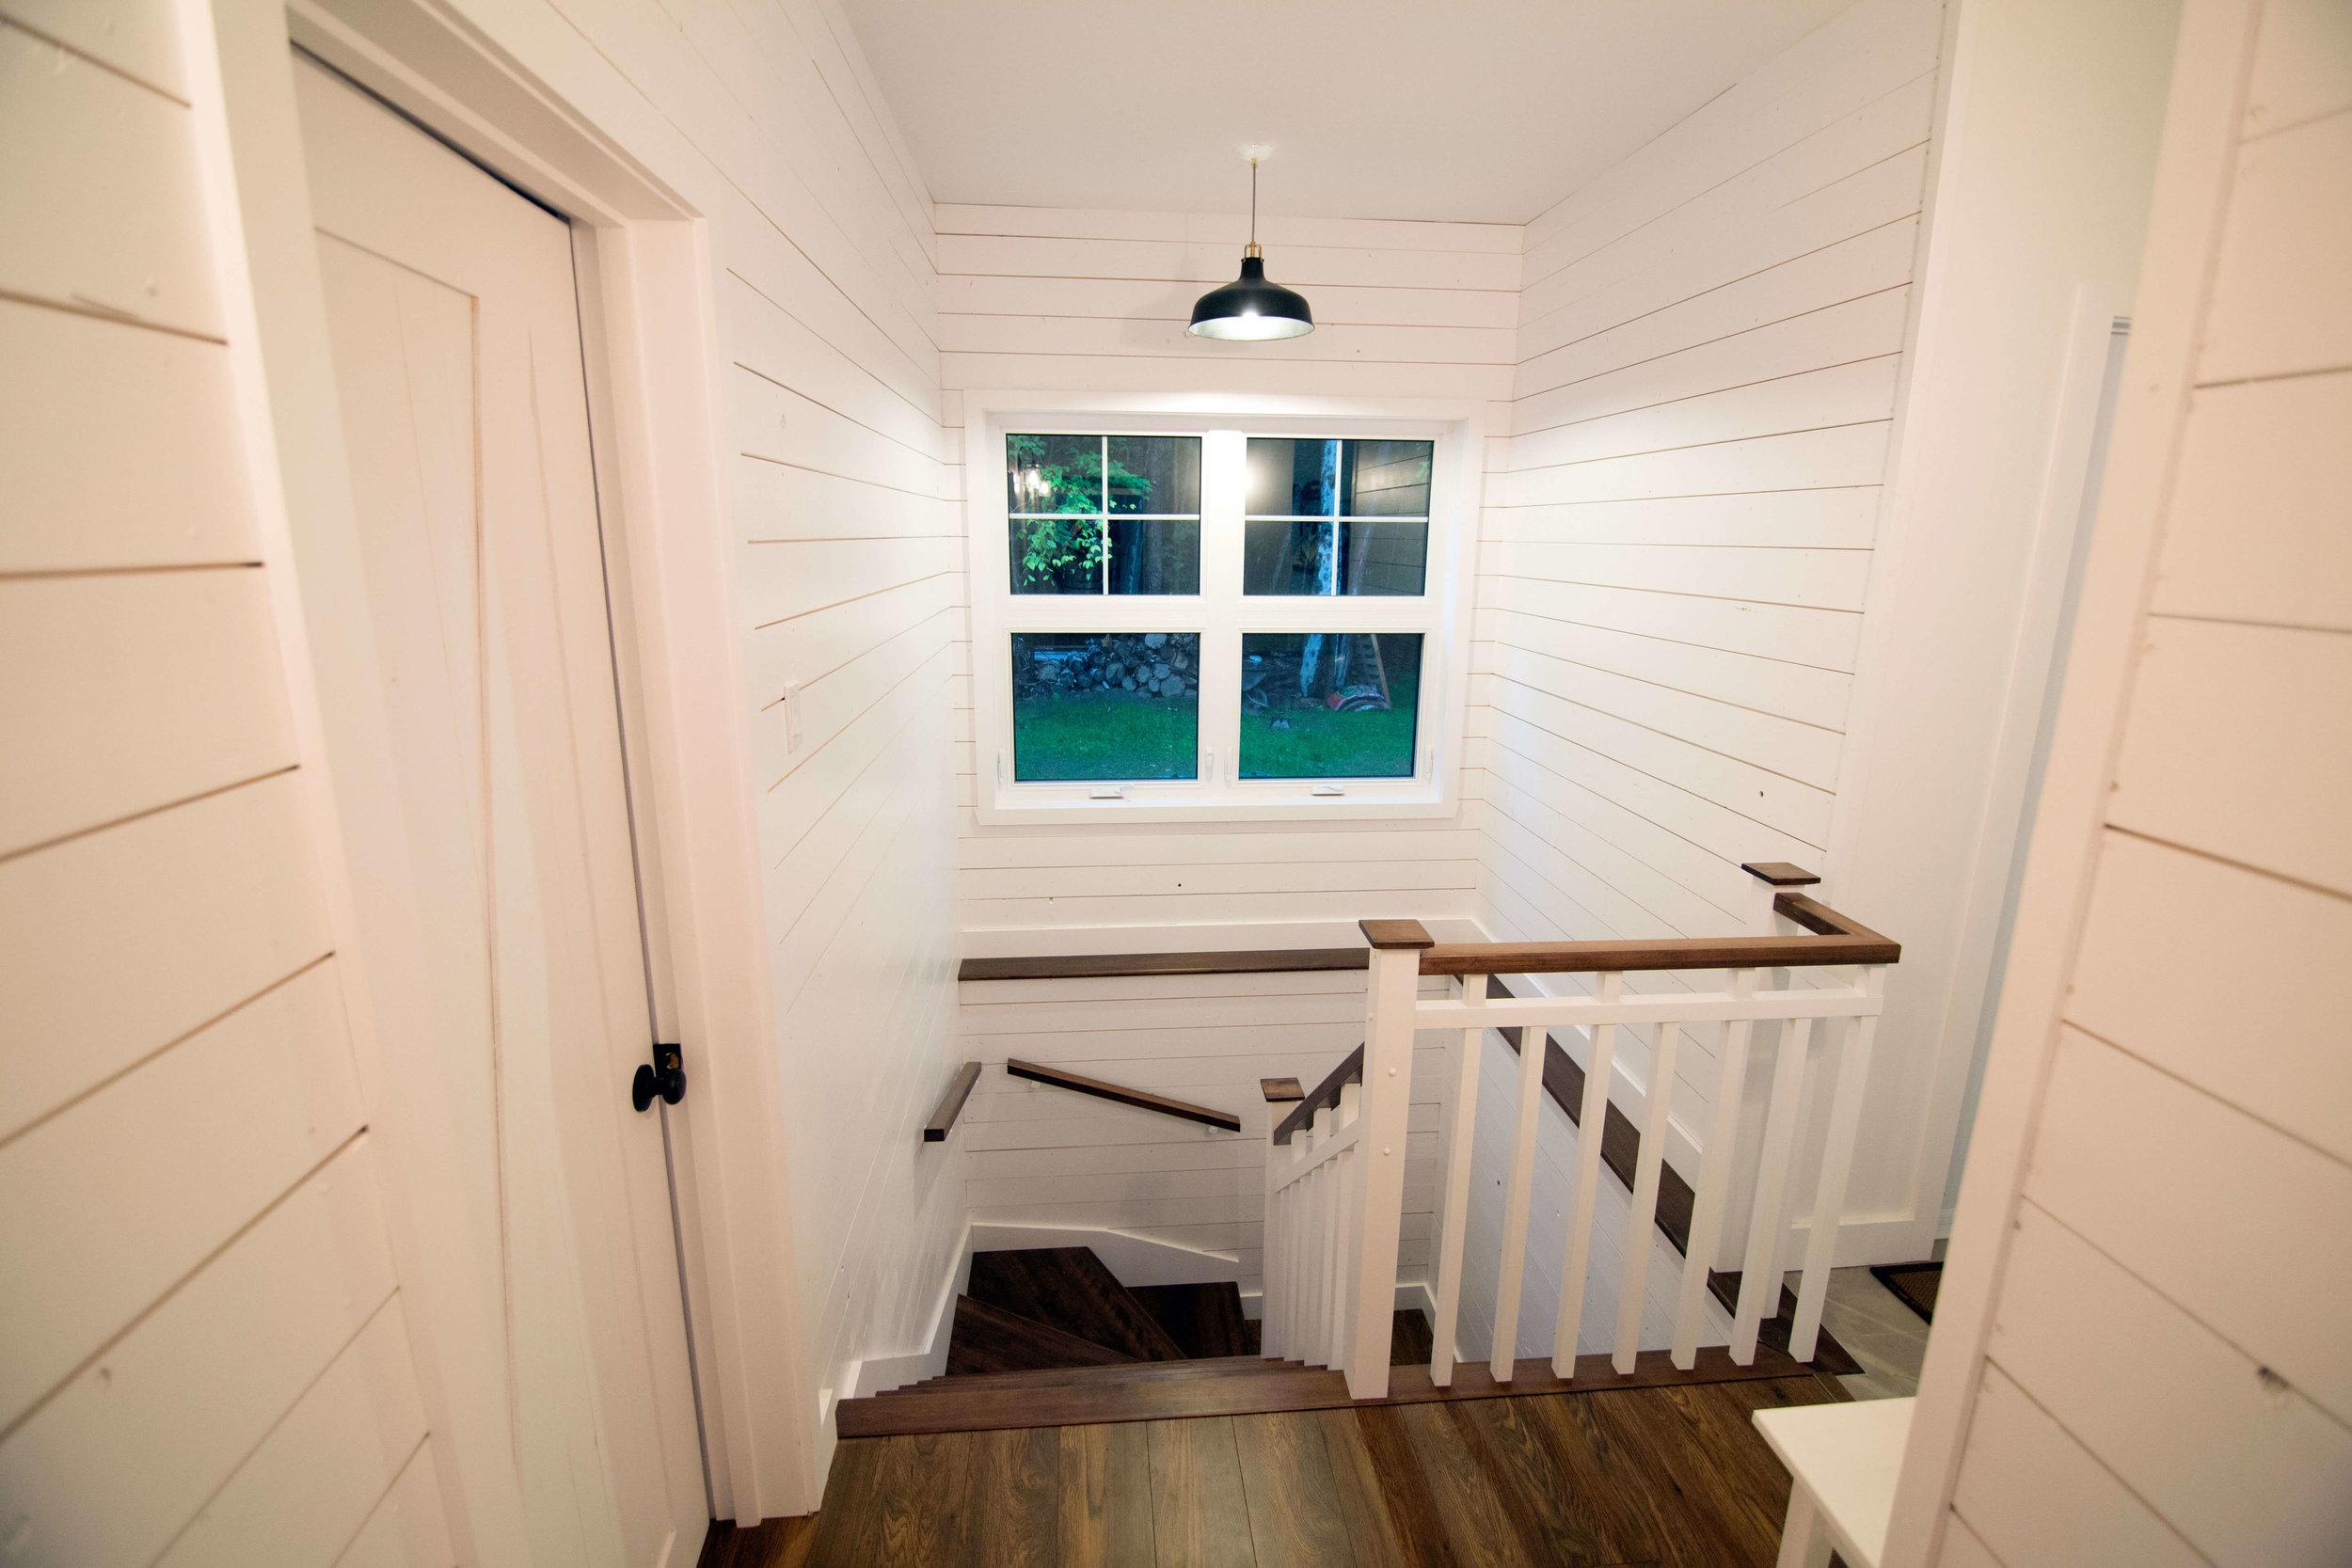 escalier-nobilis-2016-renovation-leblanc